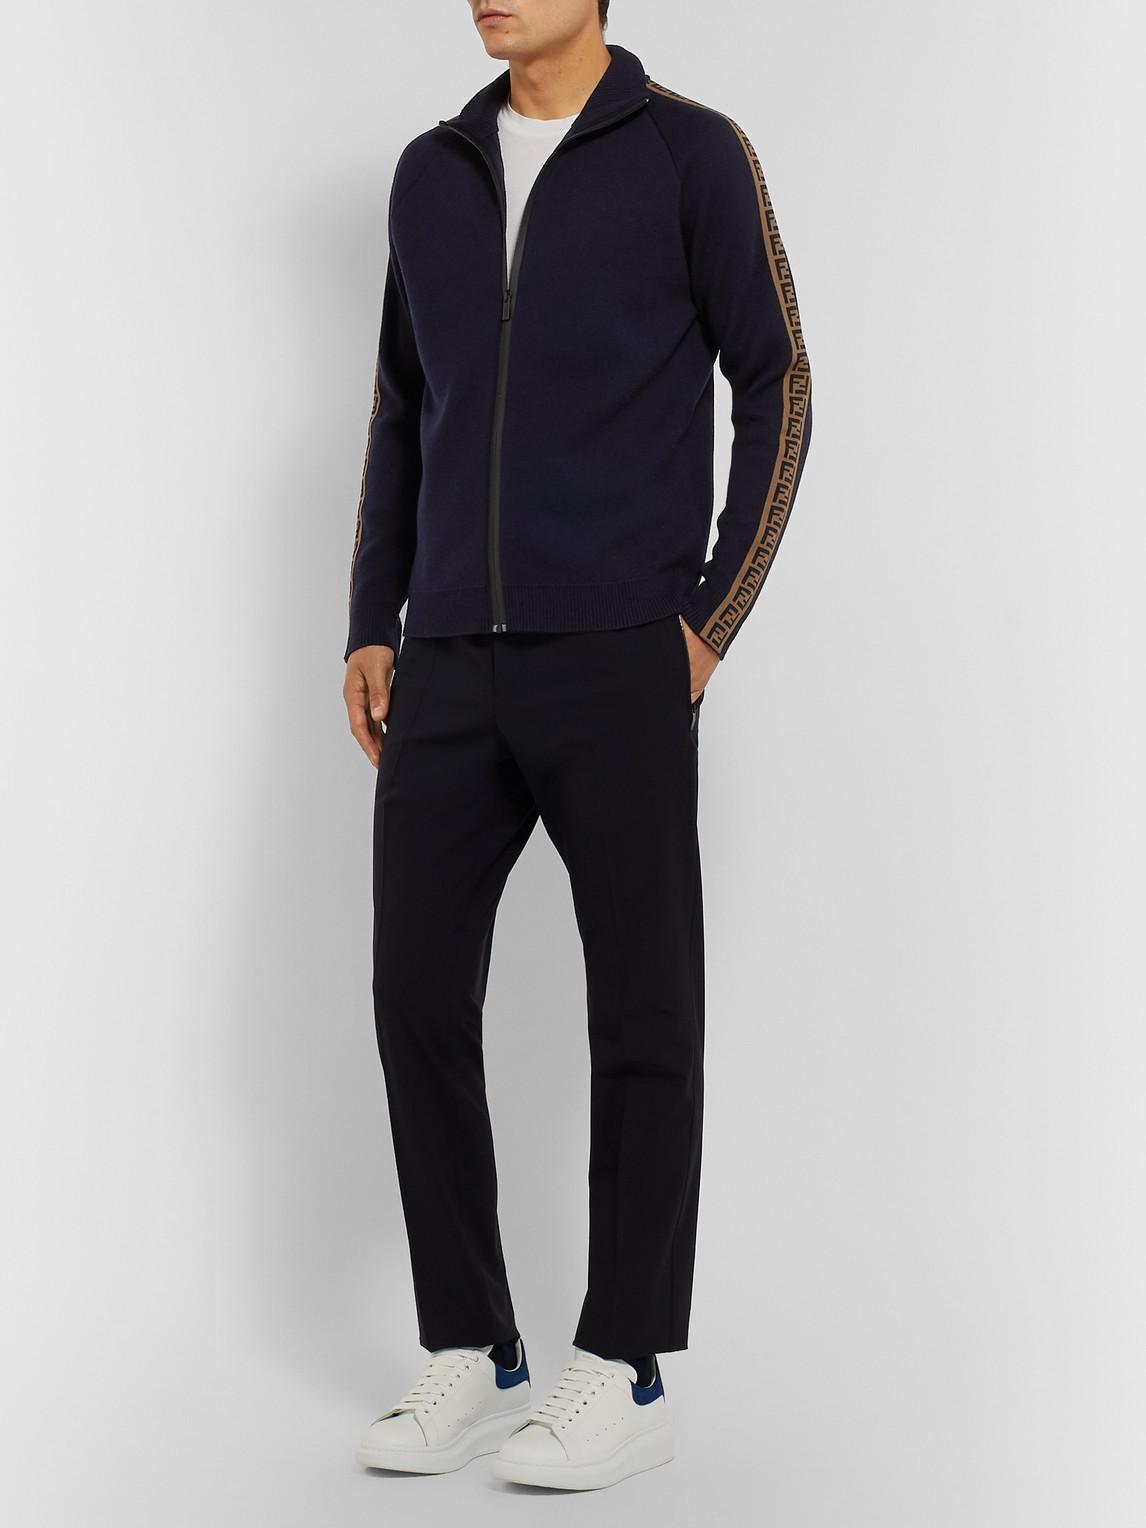 Fendi Sweaters SLIM-FIT LOGO-TRIMMED WOOL ZIP-UP SWEATER